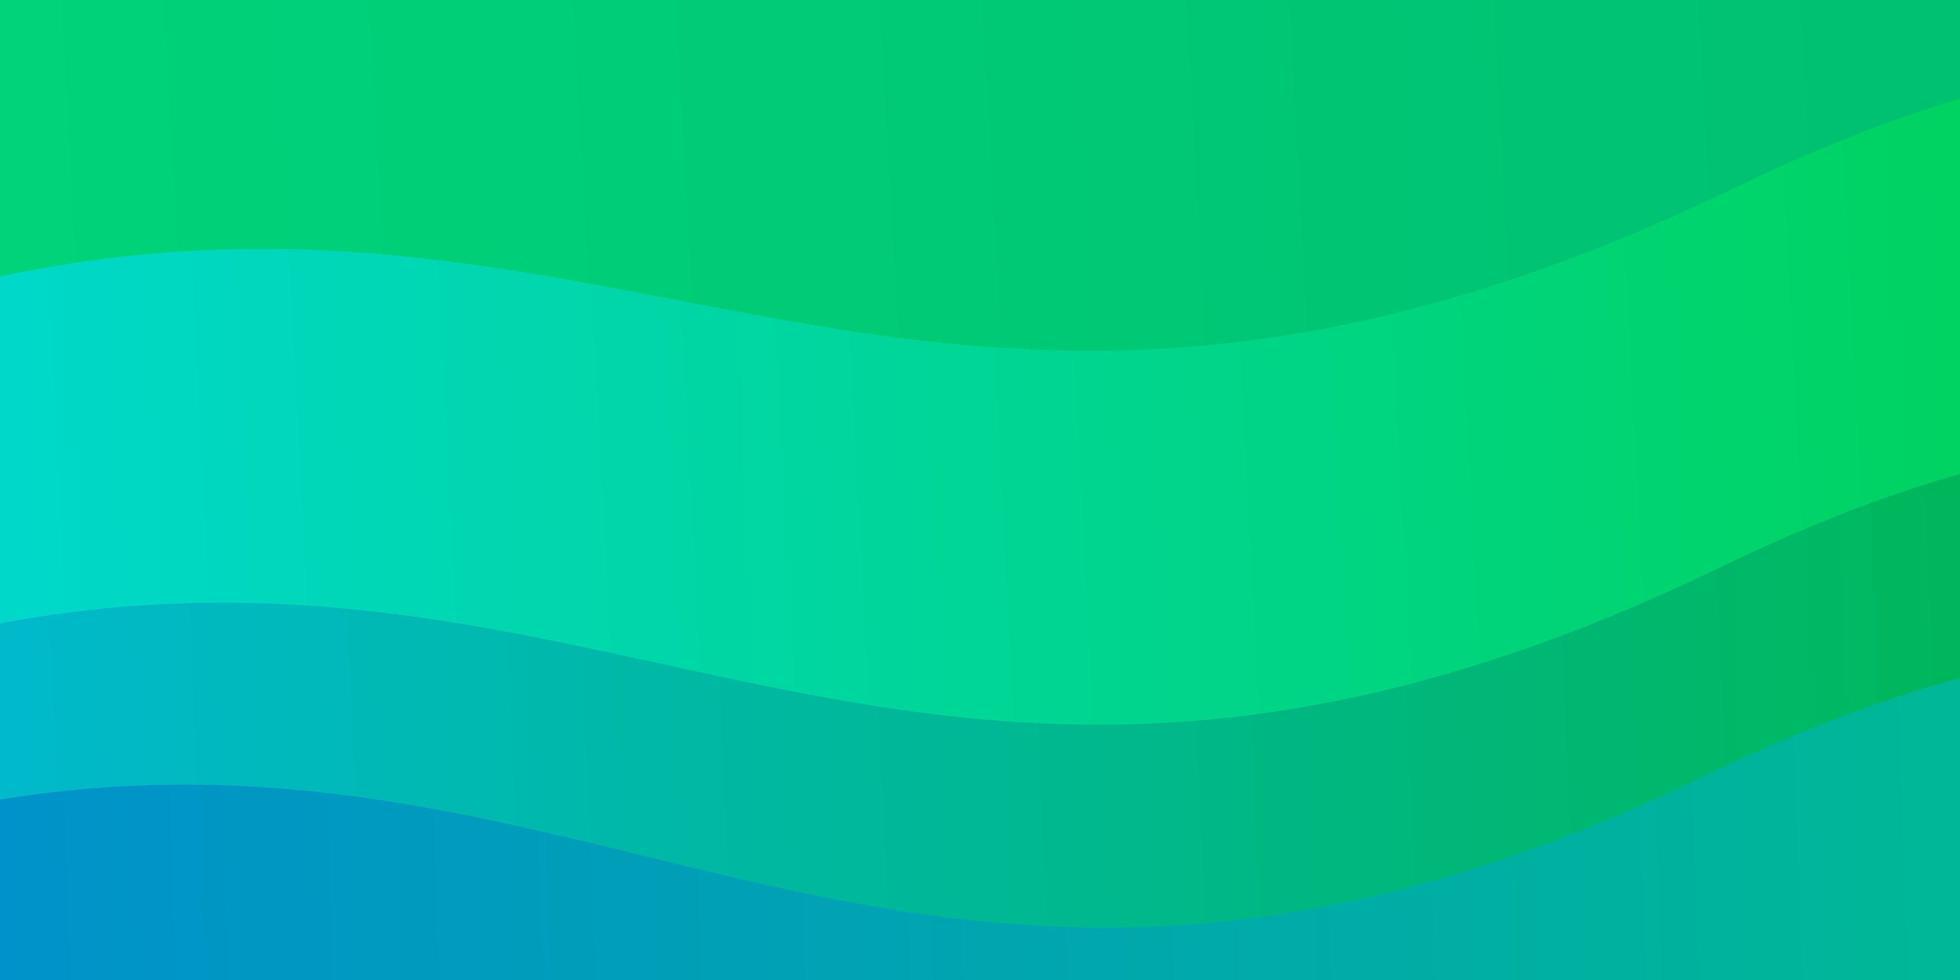 Light Blue, Green vector texture with circular arc.